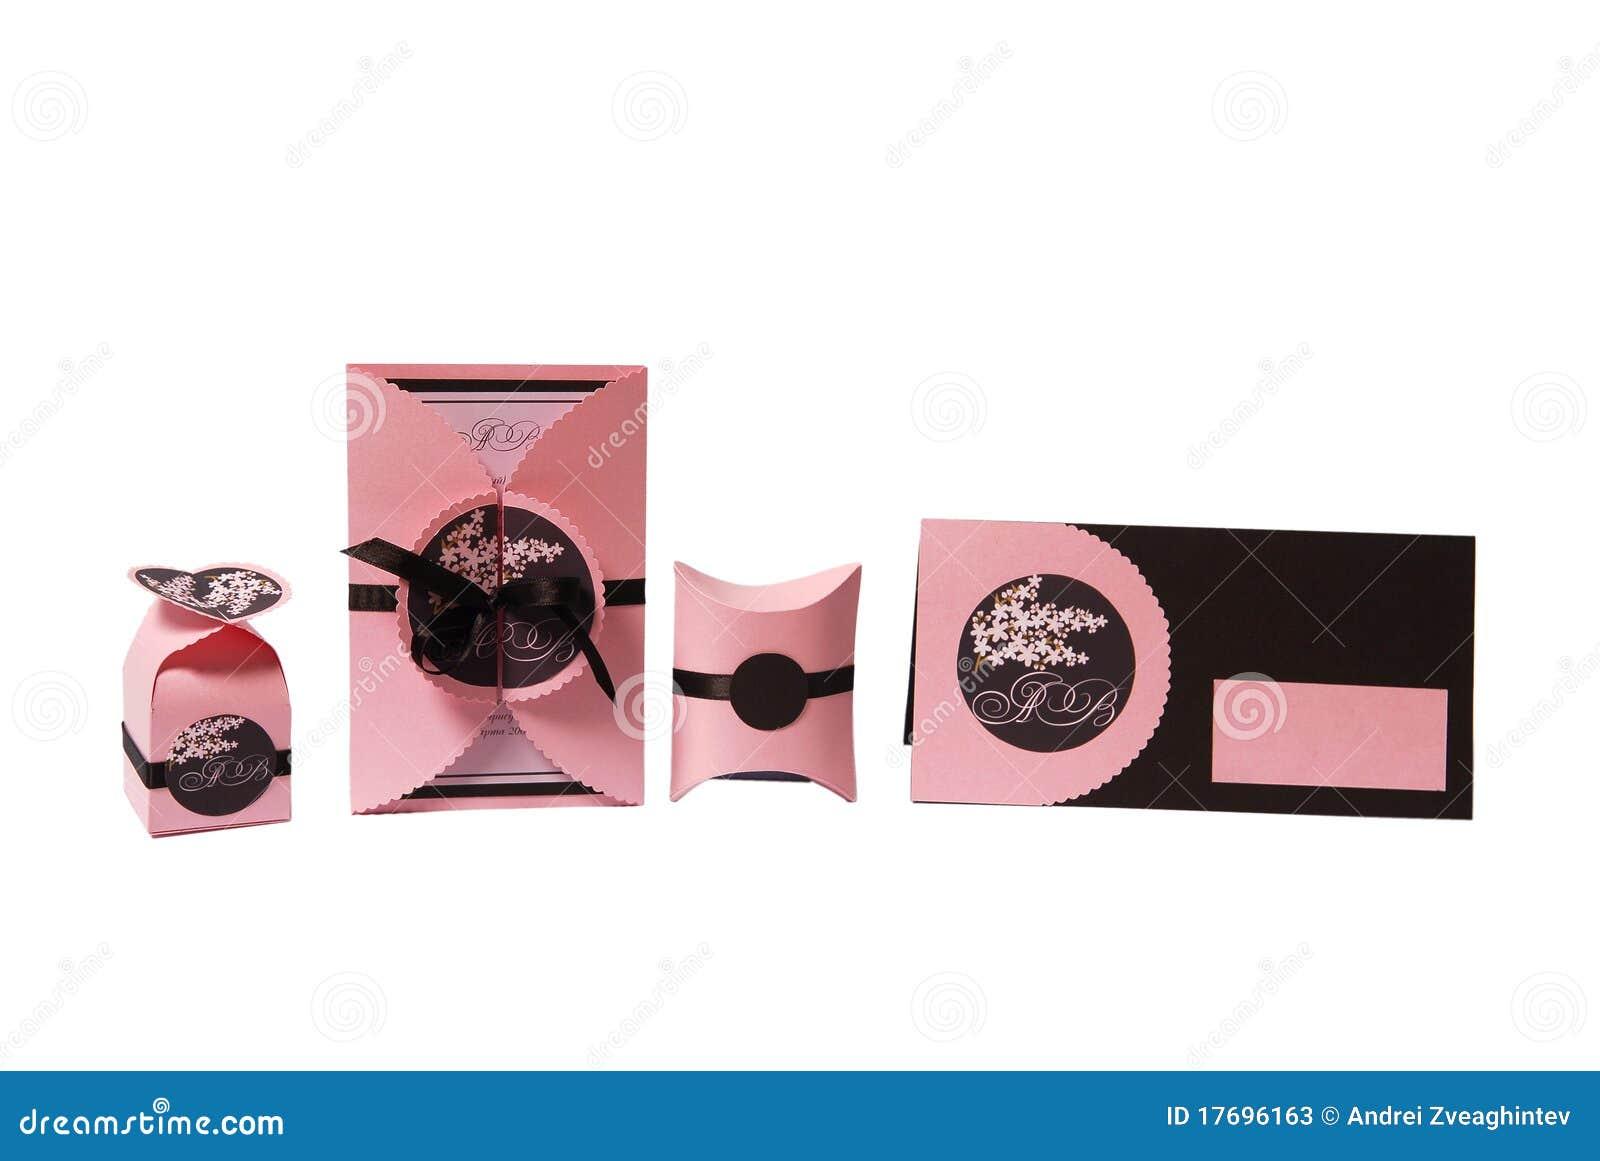 Wedding Gift Using Invitation : Wedding Invitation And Gift Box Stock PhotosImage: 17696163